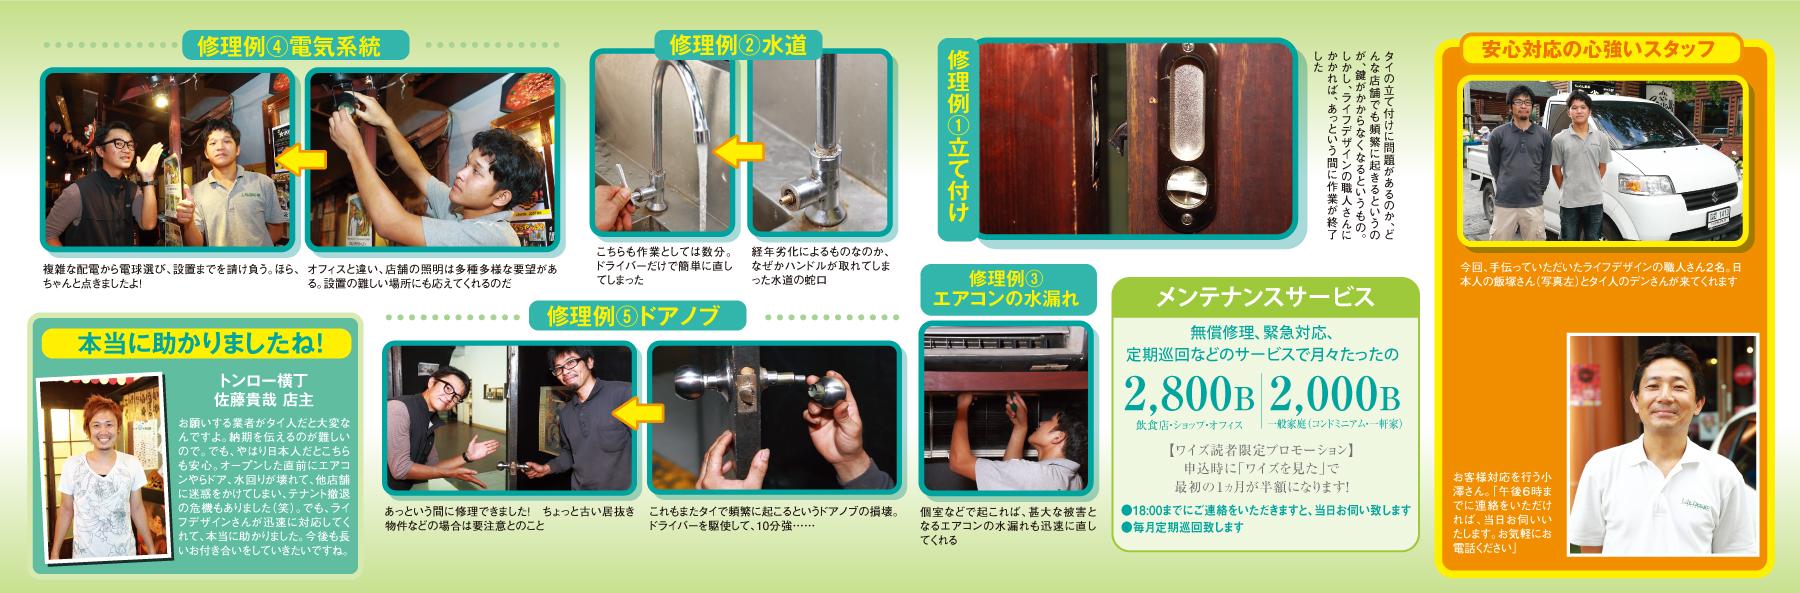 419_Zoom in_life design-web-02